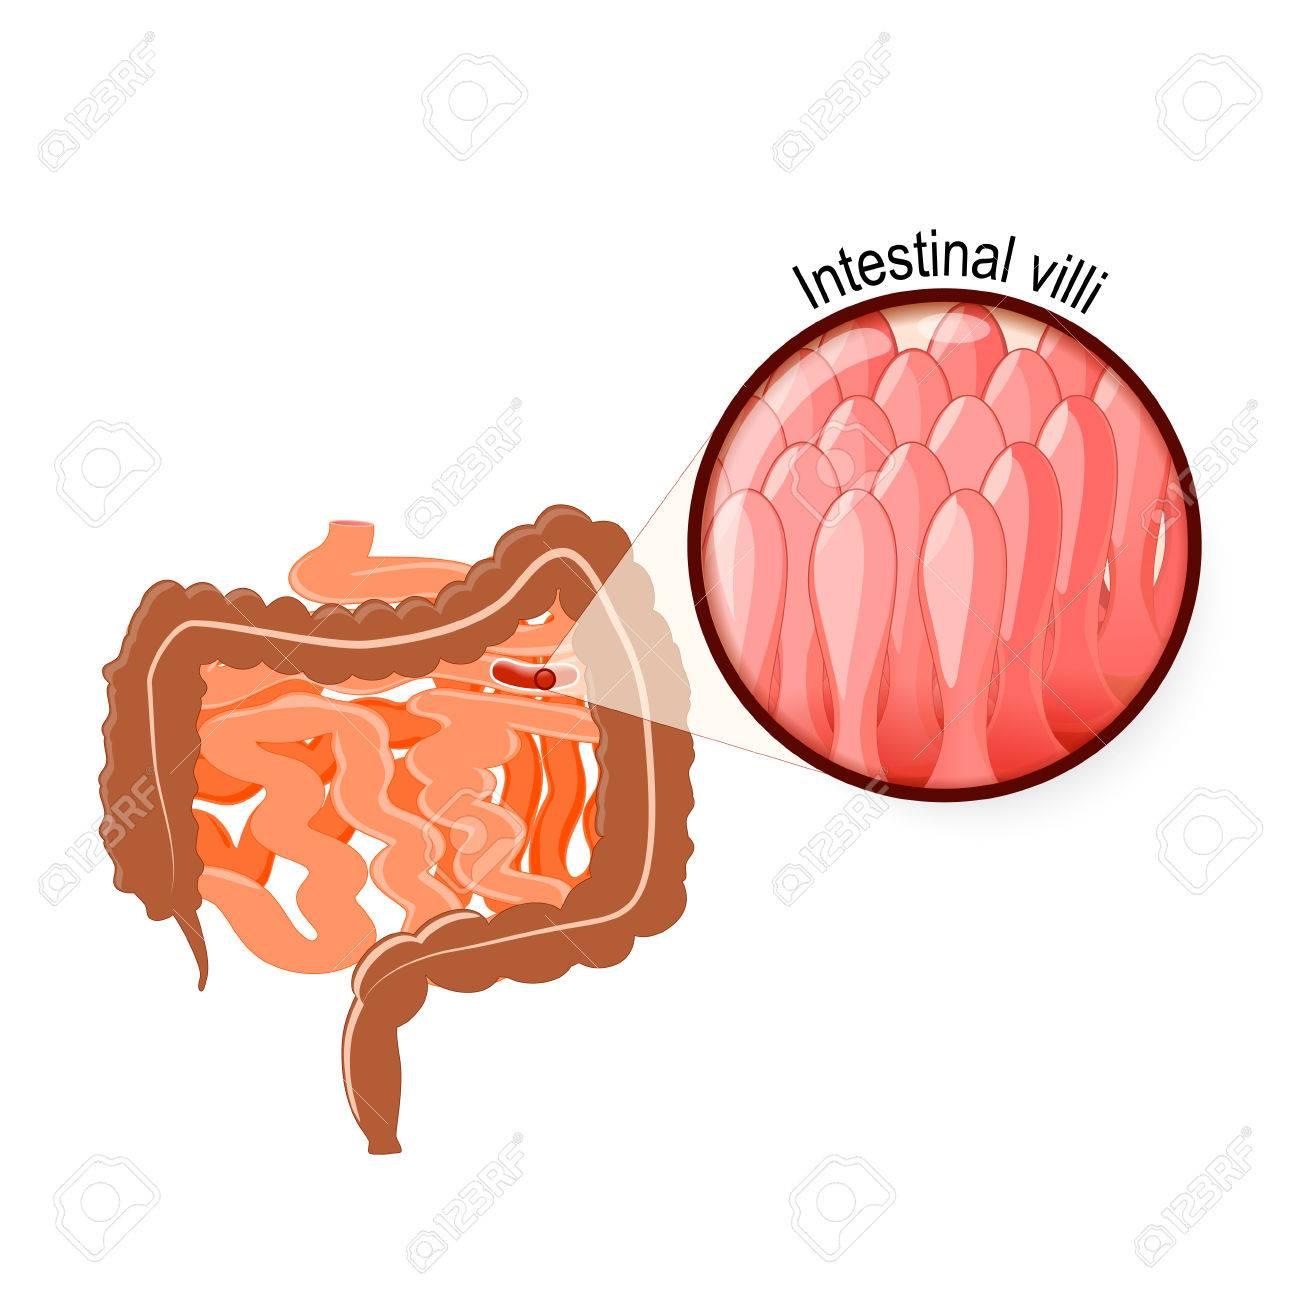 Gastrointestinal Tract Intestinal Villi Large And Small Intestine